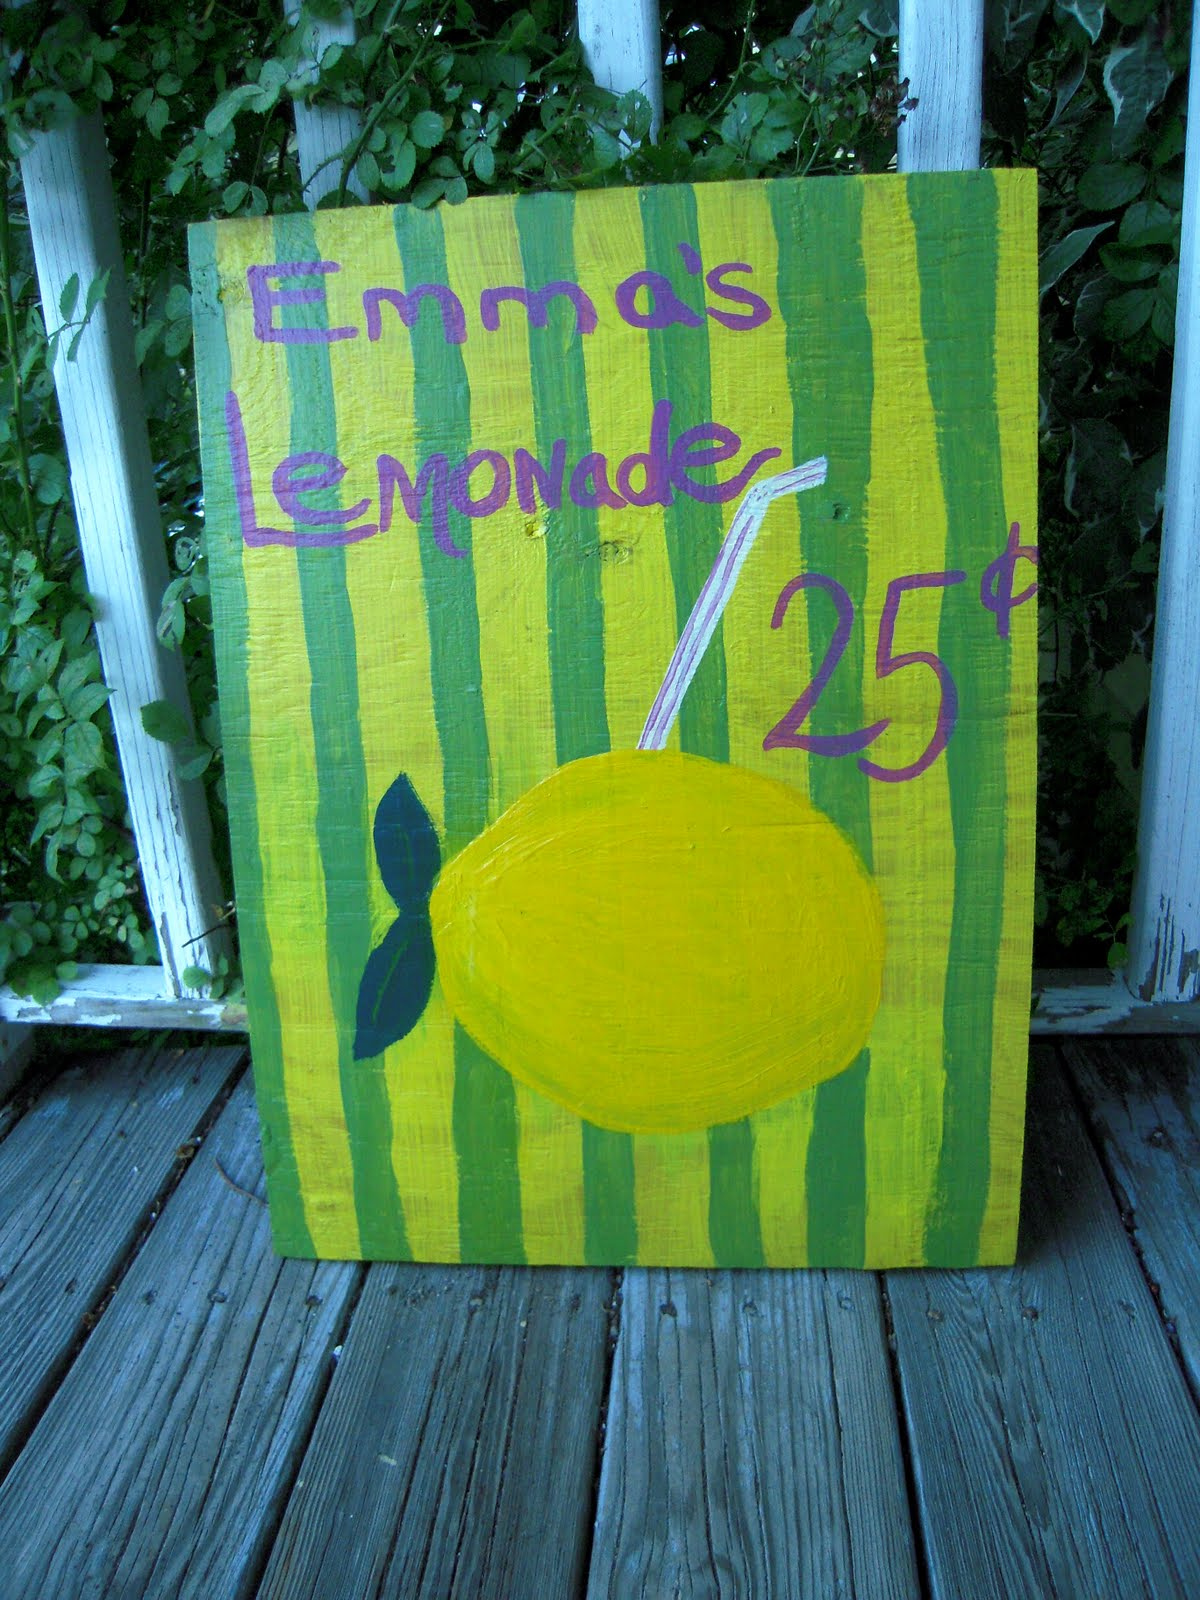 how to make a lemonade stand sign